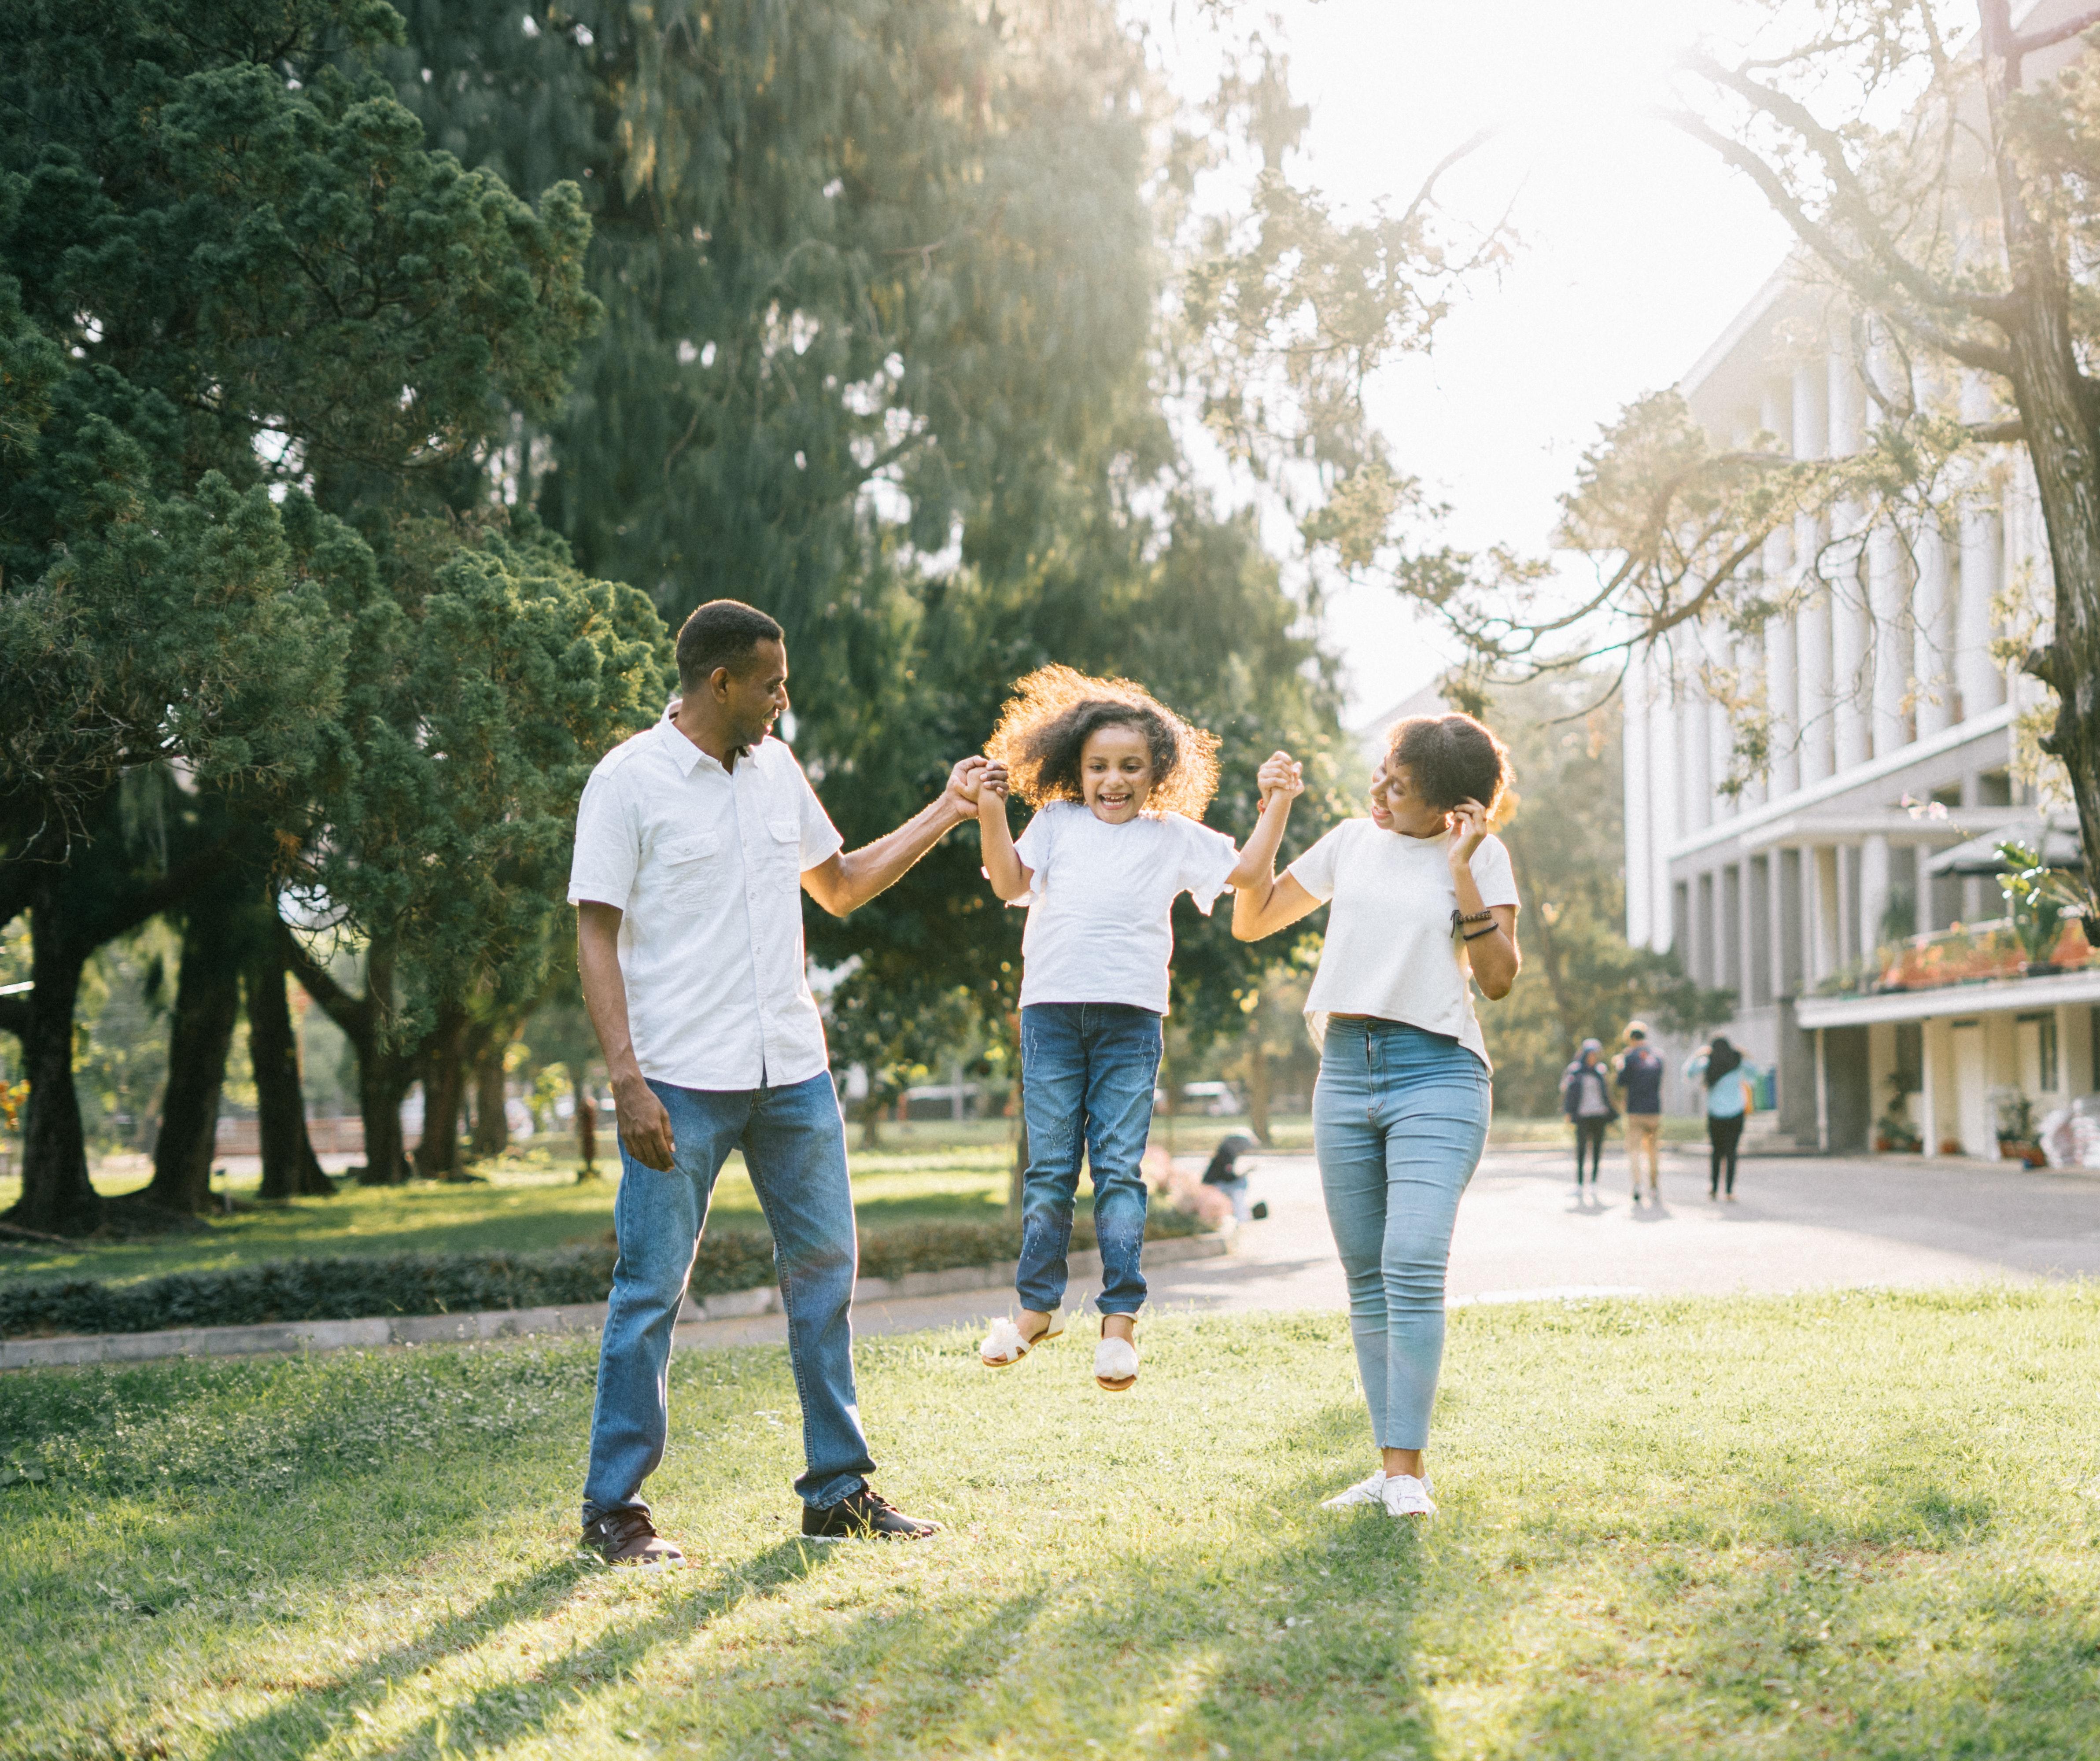 Flourishing Families Boca Raton, FL Feller Financial Services